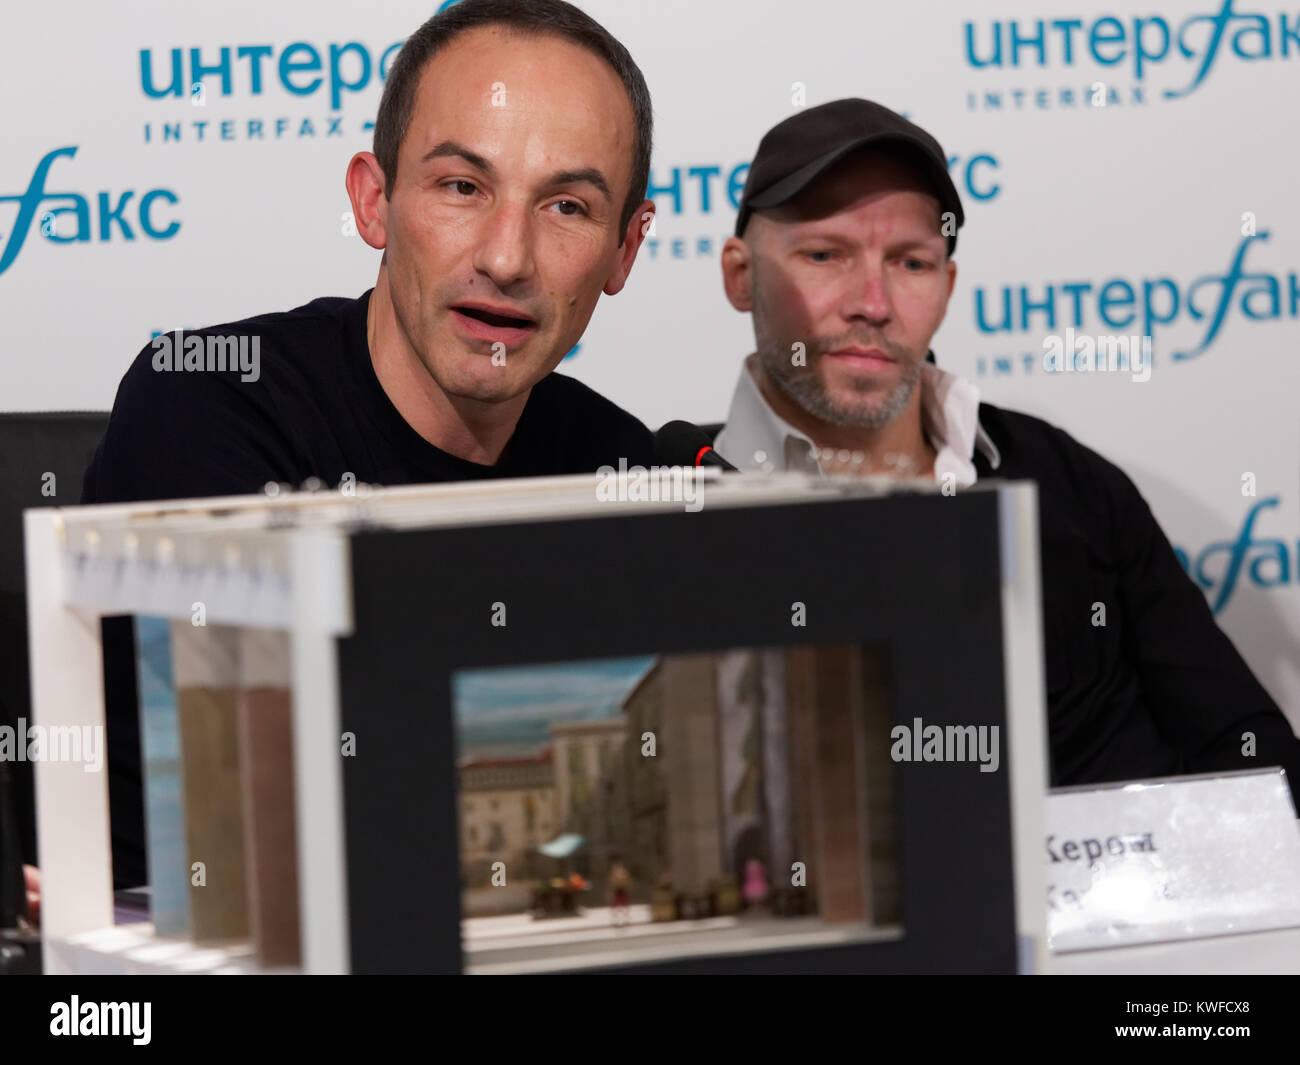 St. Petersburg, Russia - December 11, 2017: Costume and set designer Jerome Kaplan (left) and choreographer Johan - Stock Image